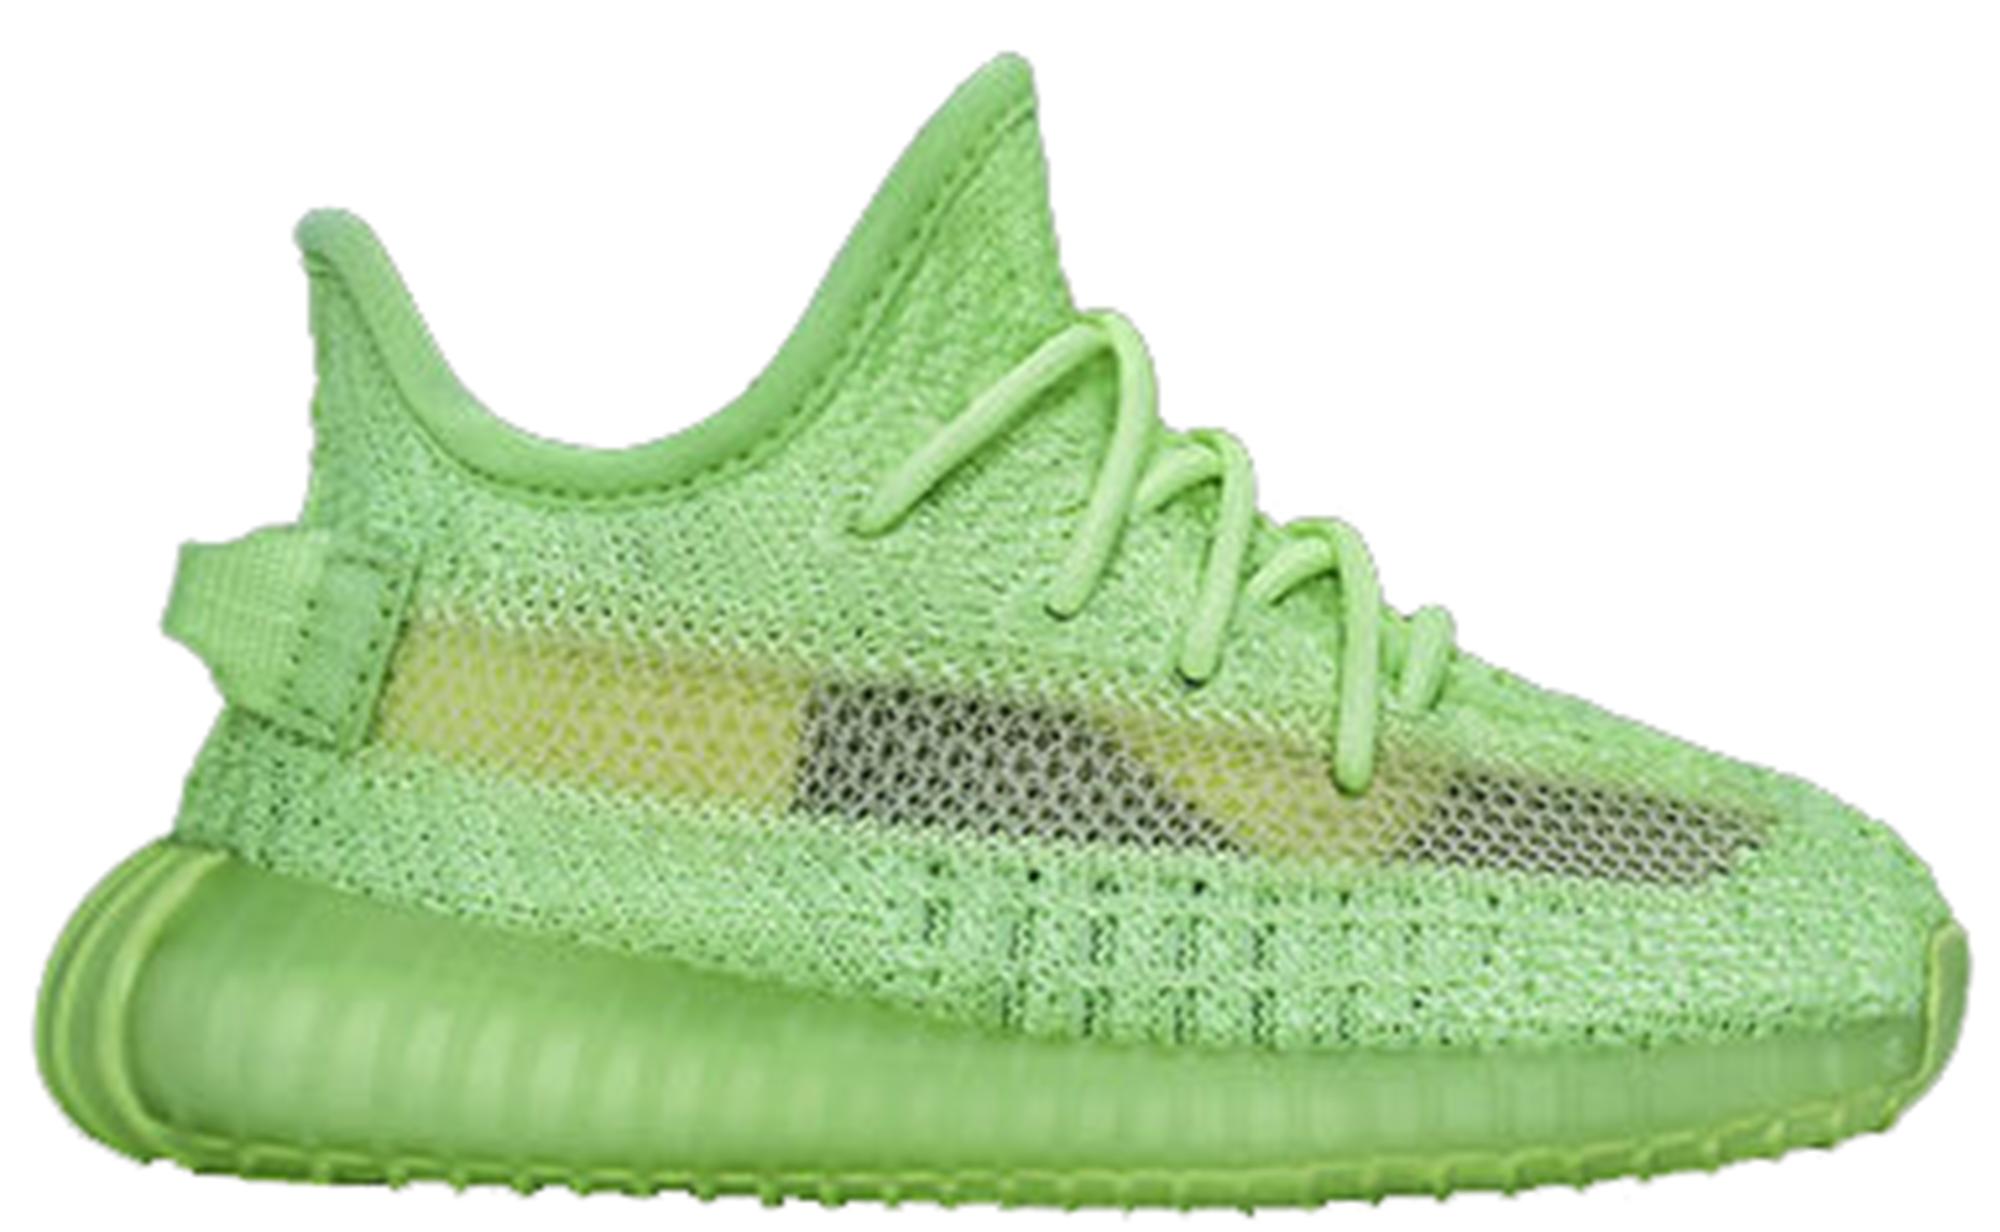 adidas Yeezy Boost 350 V2 Glow (TD)